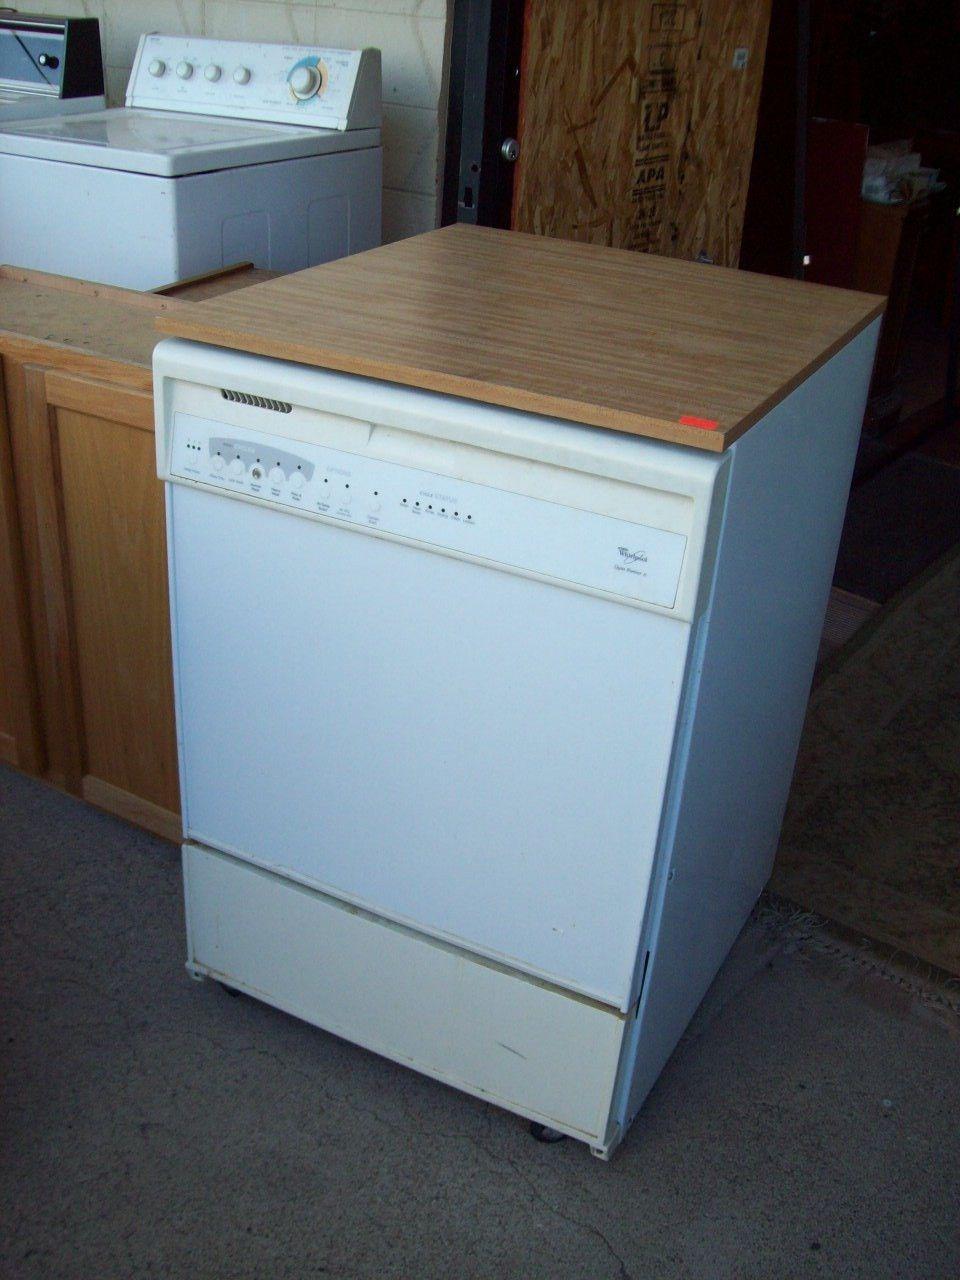 Portable dishwasher 9105 | remodel | Pinterest | Portable dishwasher ...